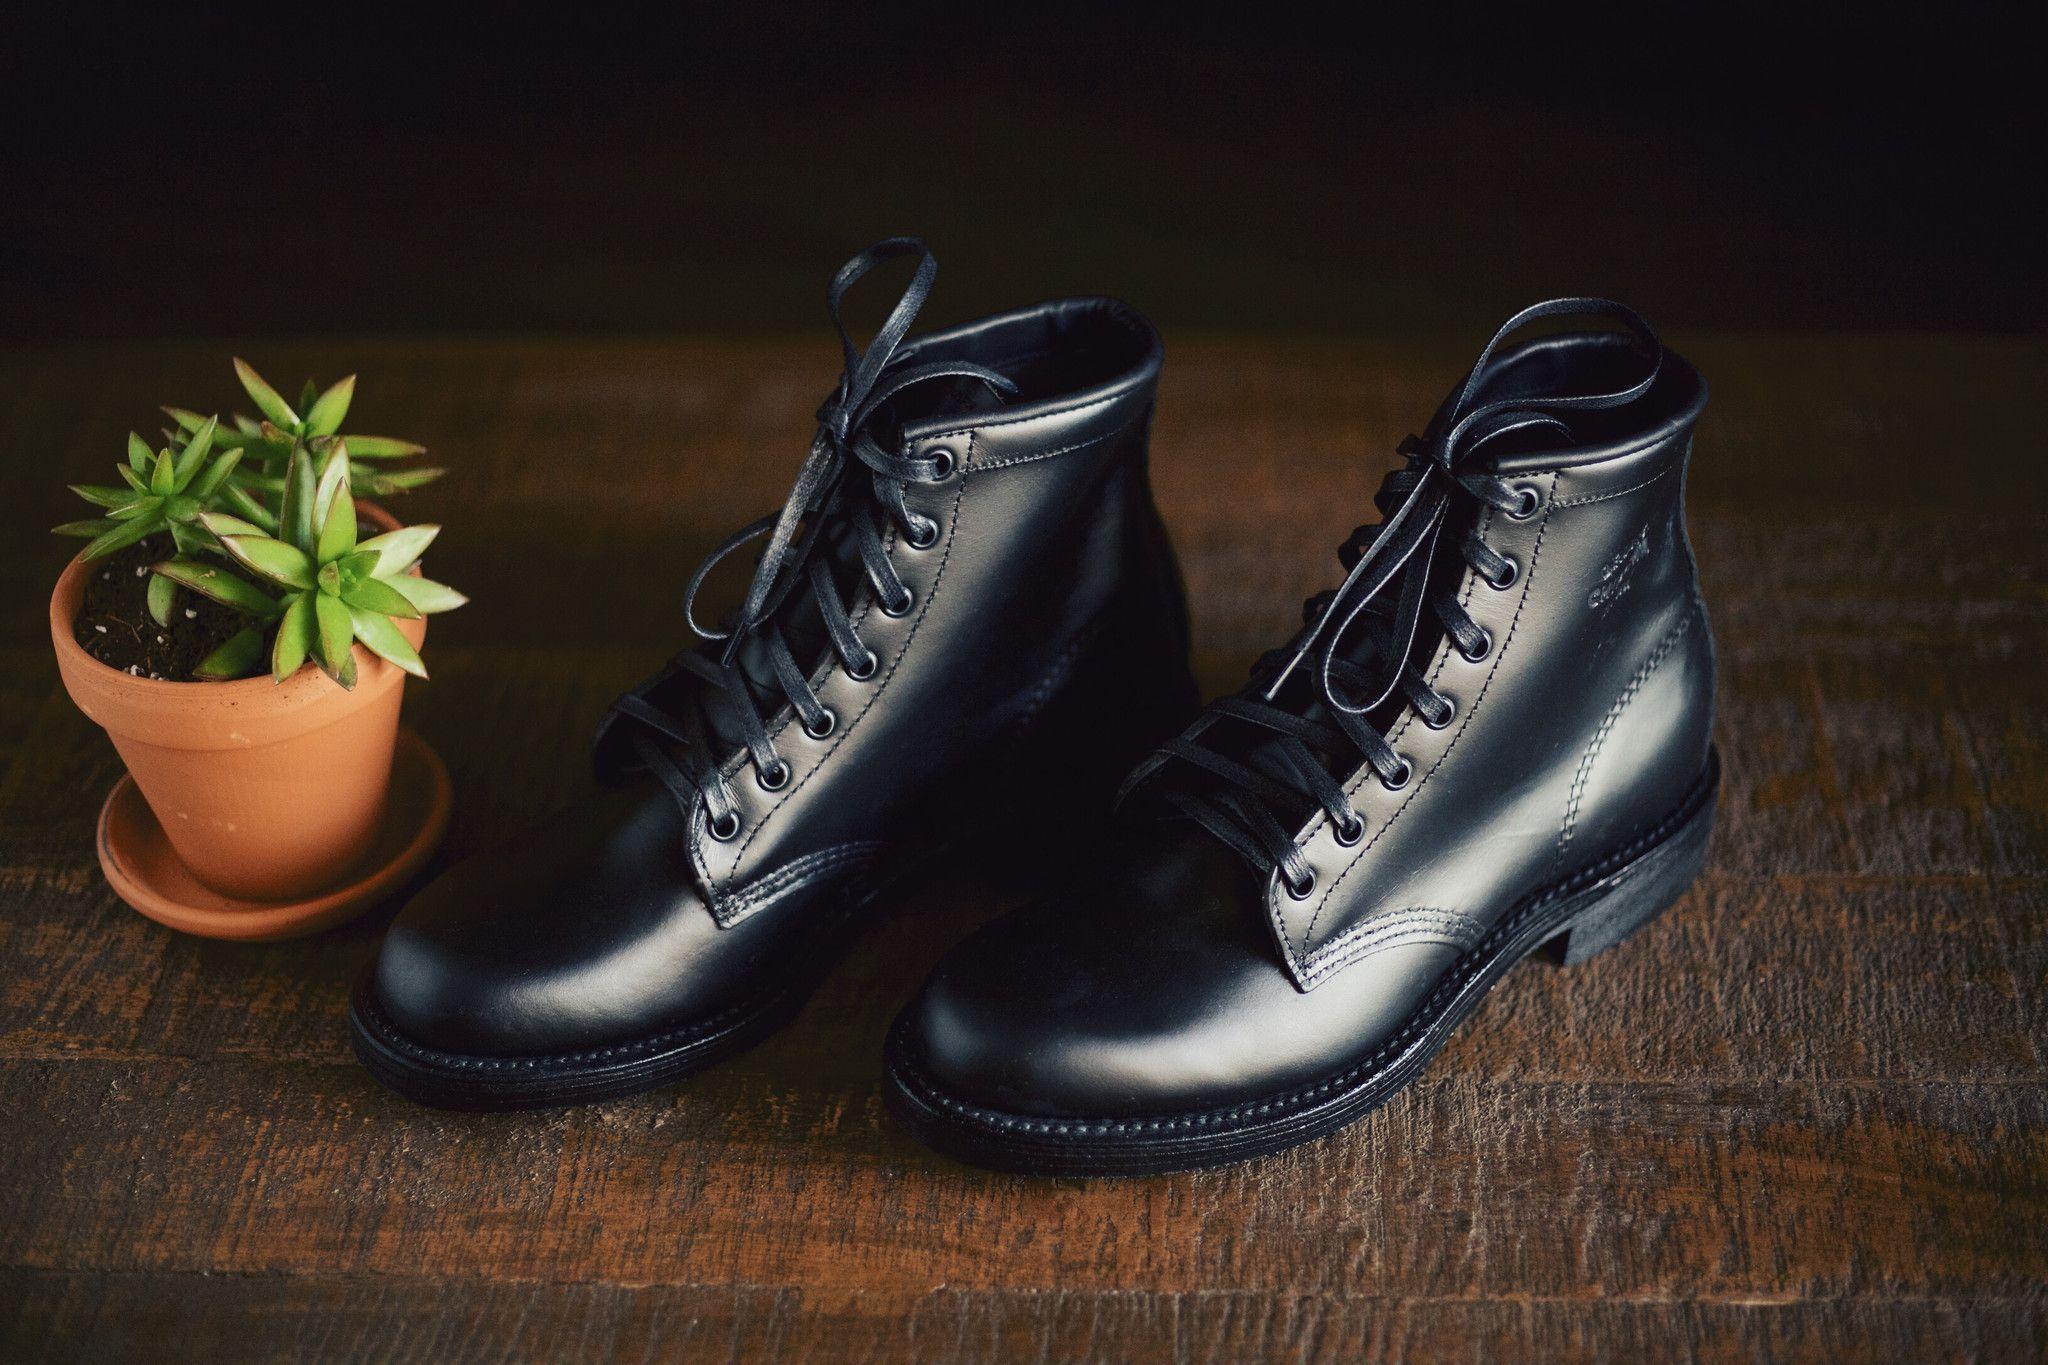 Chippewa aldrich boot trooper black boots chippewa